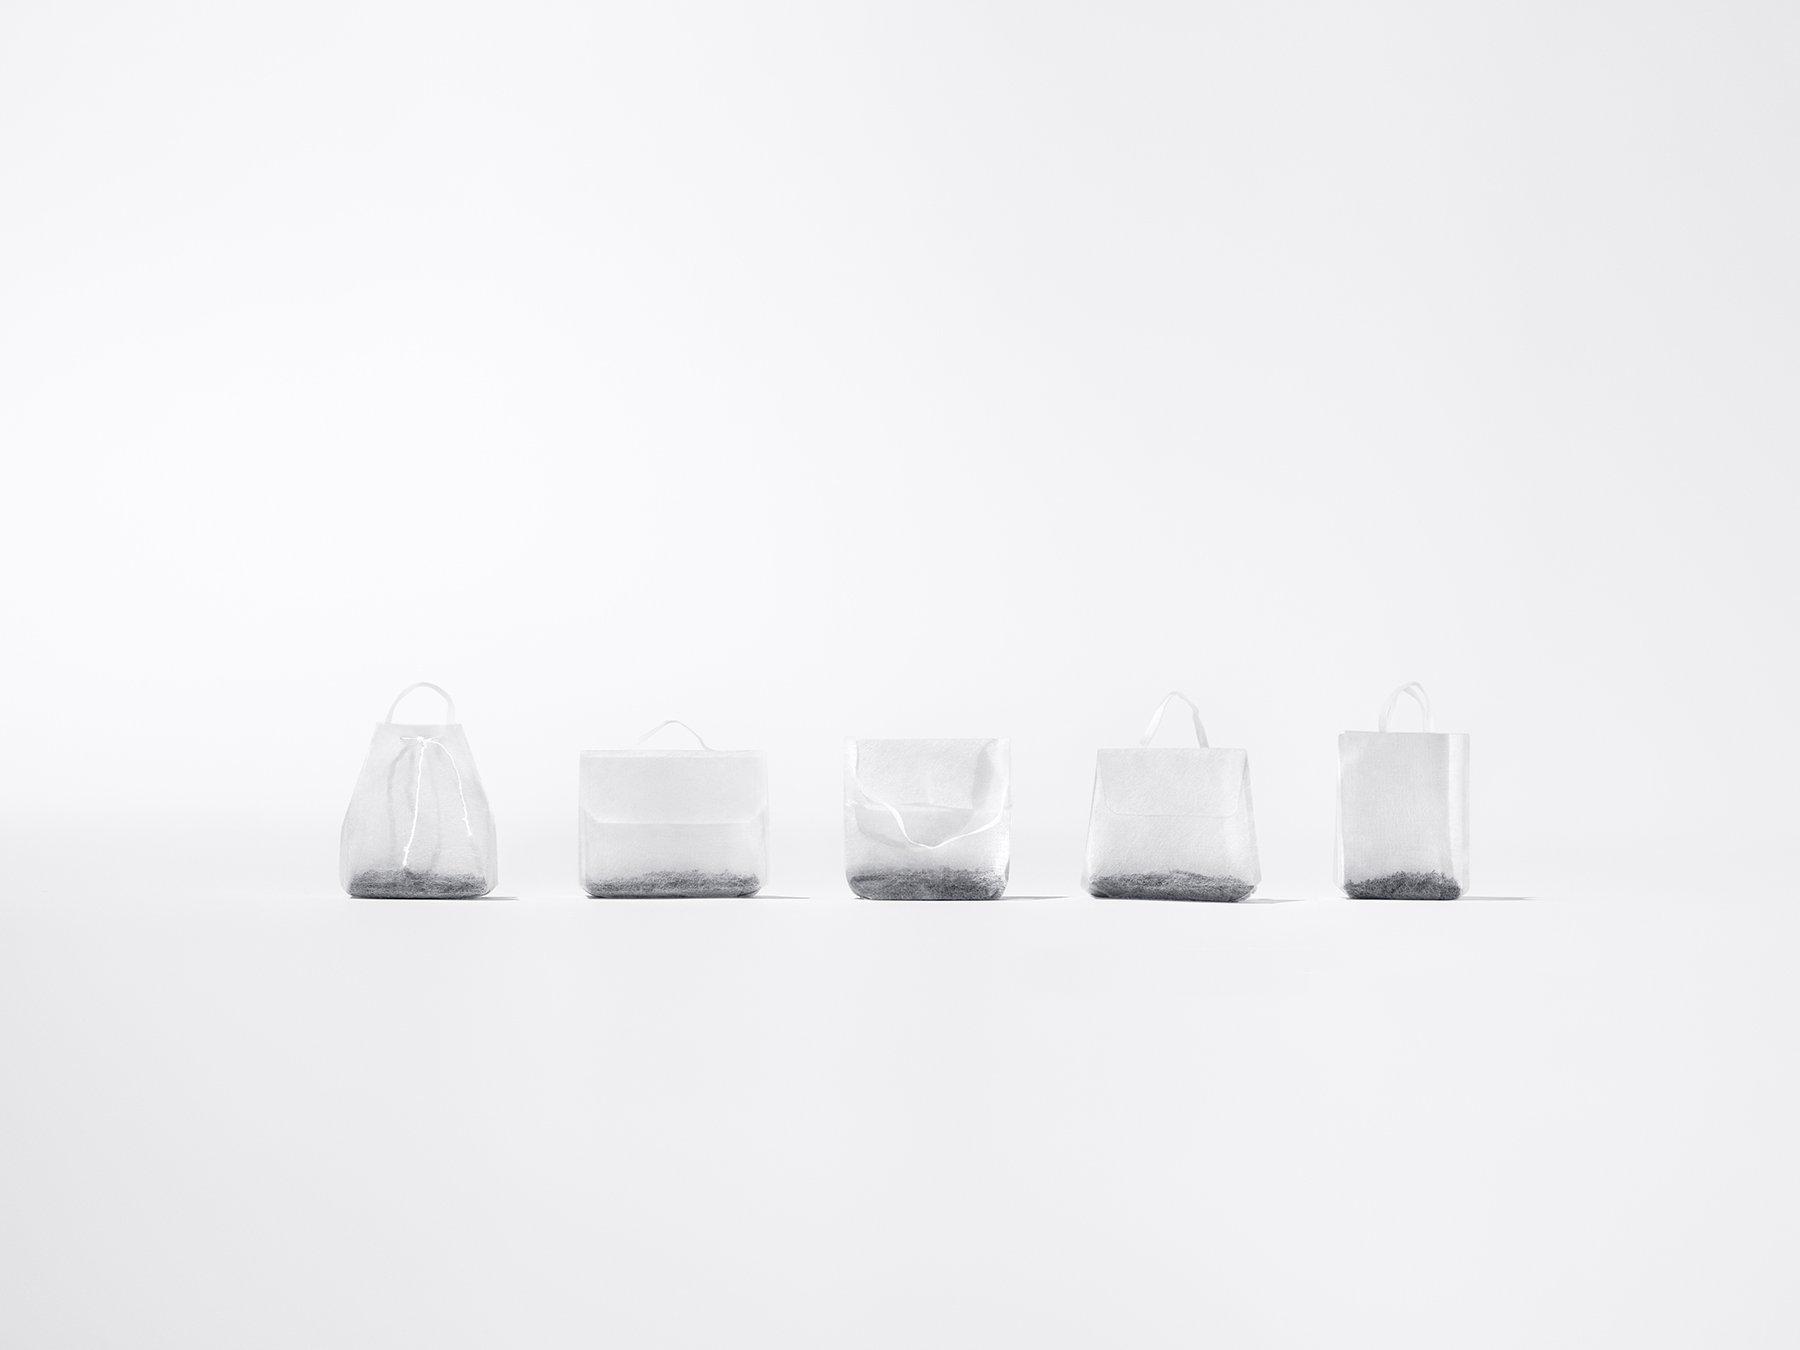 iGNANT-Design-Halssen-&-Lyon-Ayzit-Bostan-The-Teabag-Collection-02